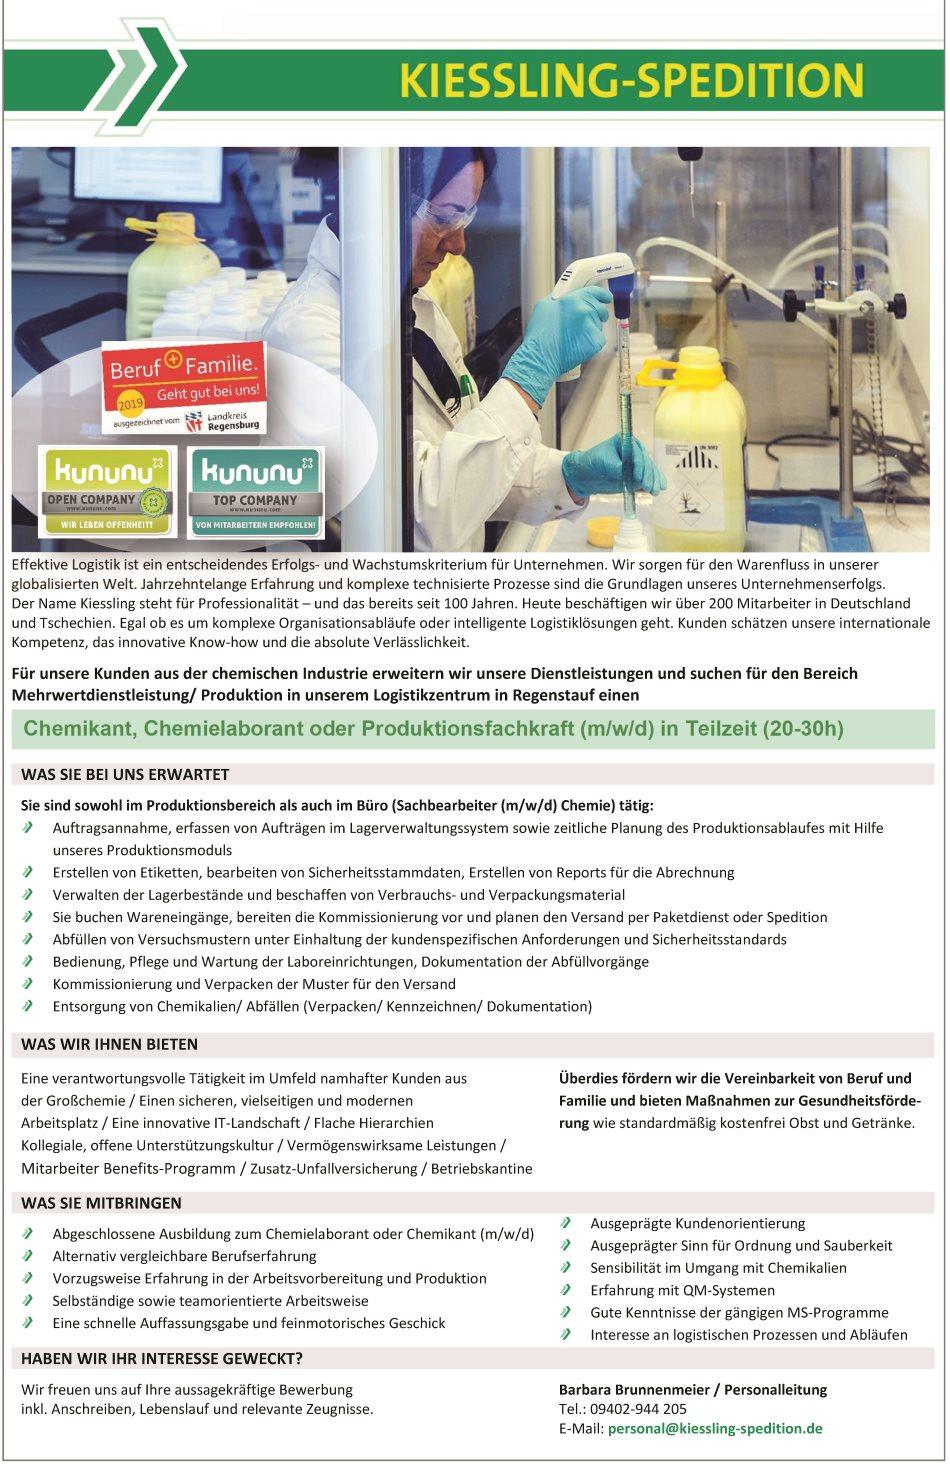 KIESSLING-SPEDITION: Chemikant, Chemielaborant oder Produktionsfachkraft (m/w/d) in Teilzeit (20-30h)